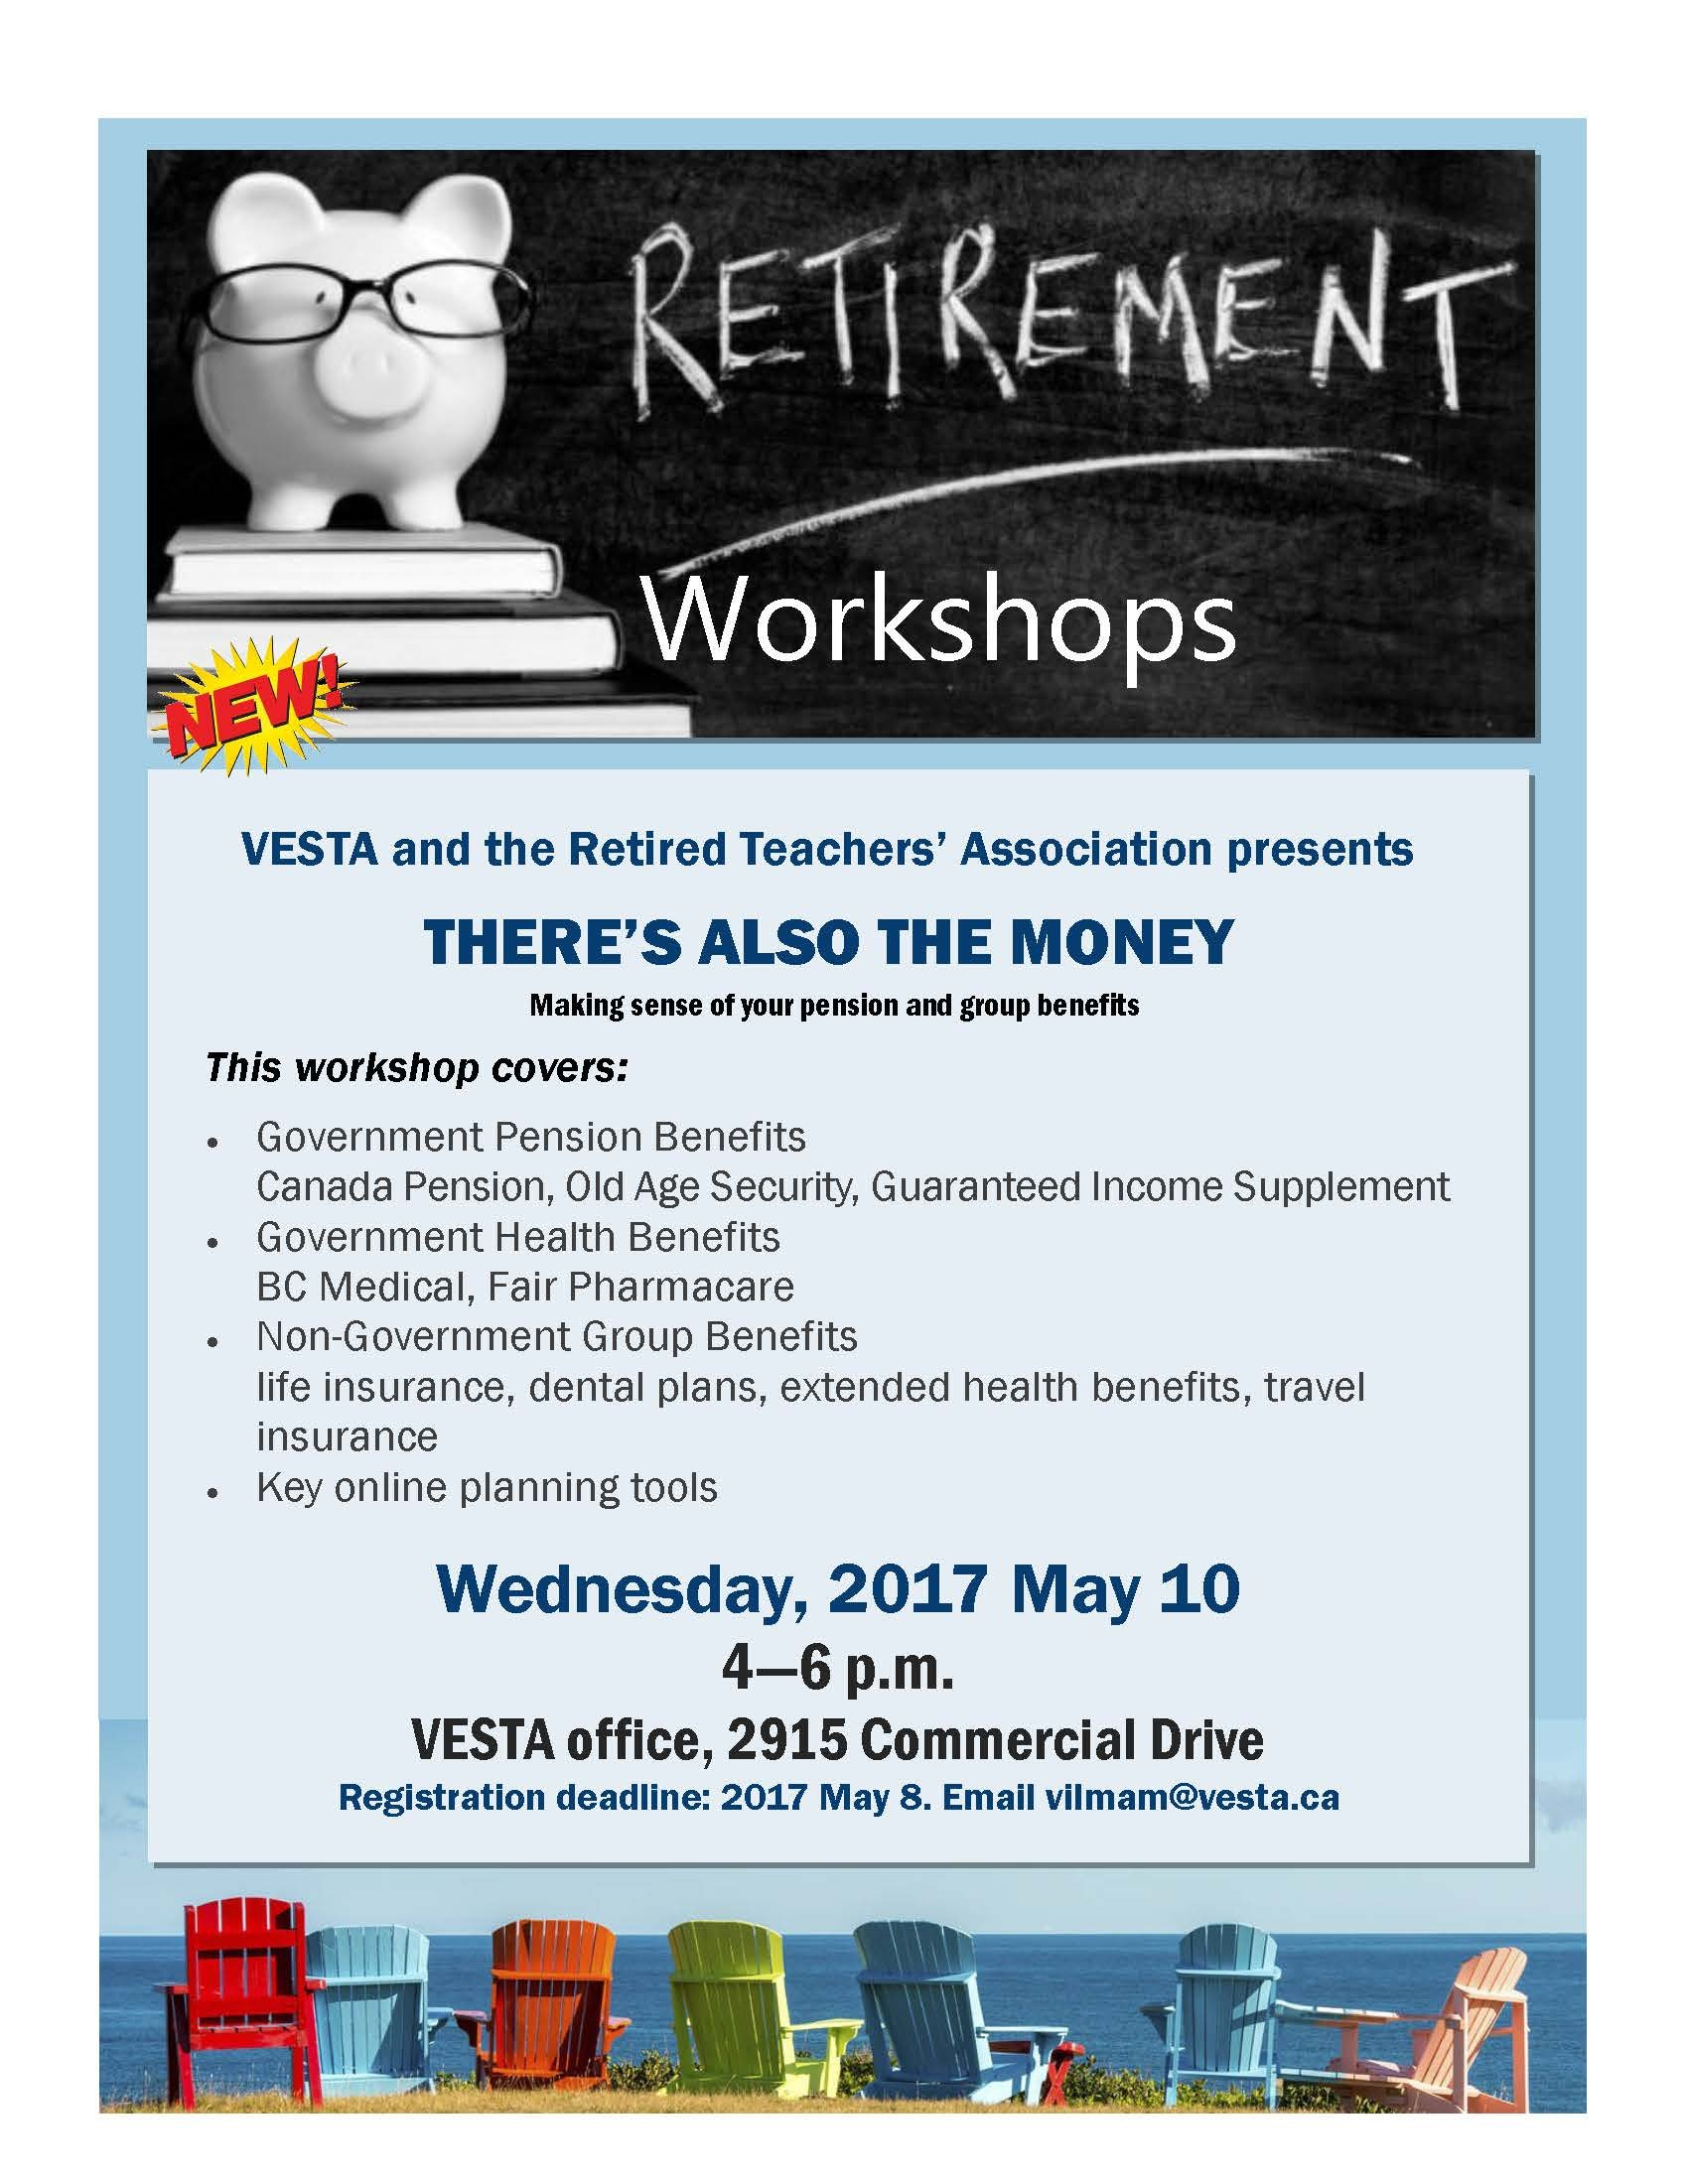 Retirement Workshop - Vancouver Elementary School Teachers Retirement Short Timer Calendar